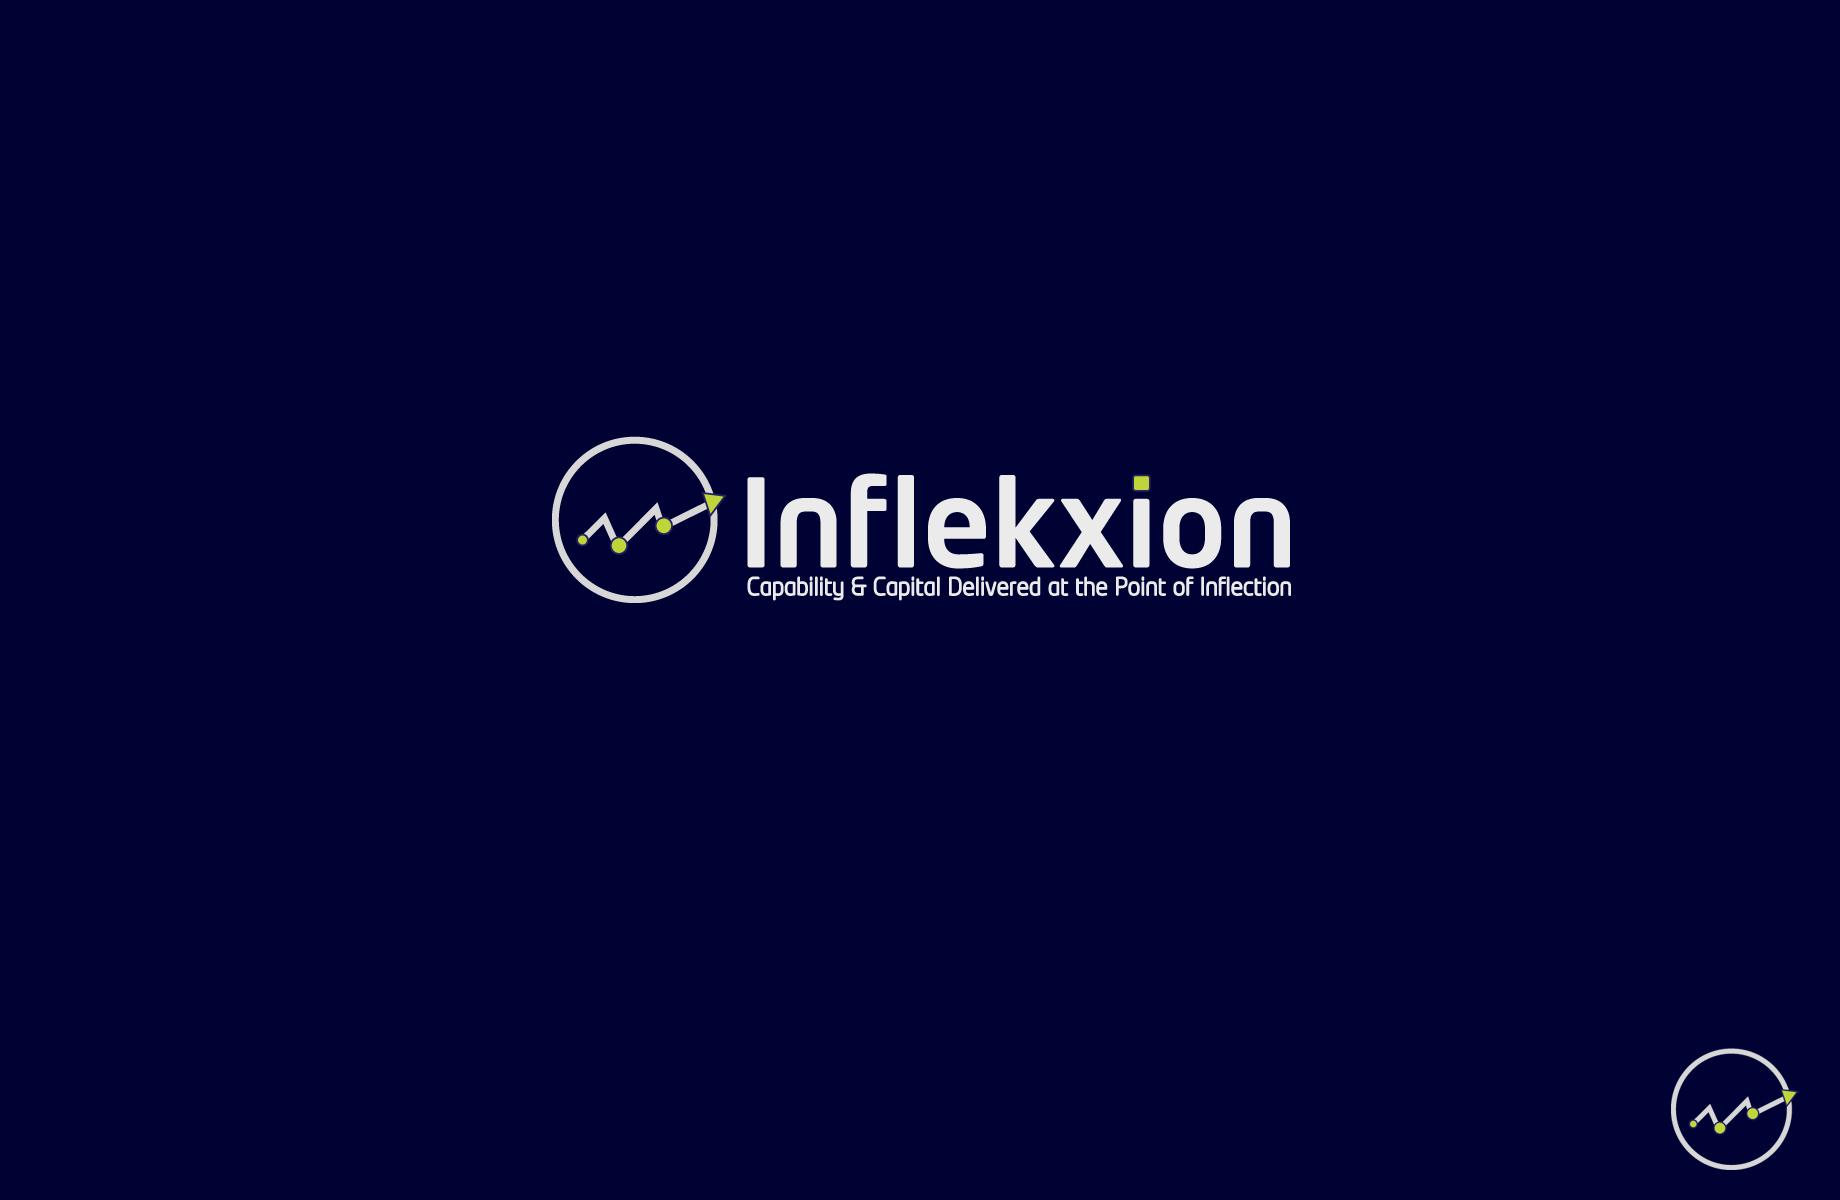 Logo Design by Jan Chua - Entry No. 76 in the Logo Design Contest Professional Logo Design for Inflekxion.